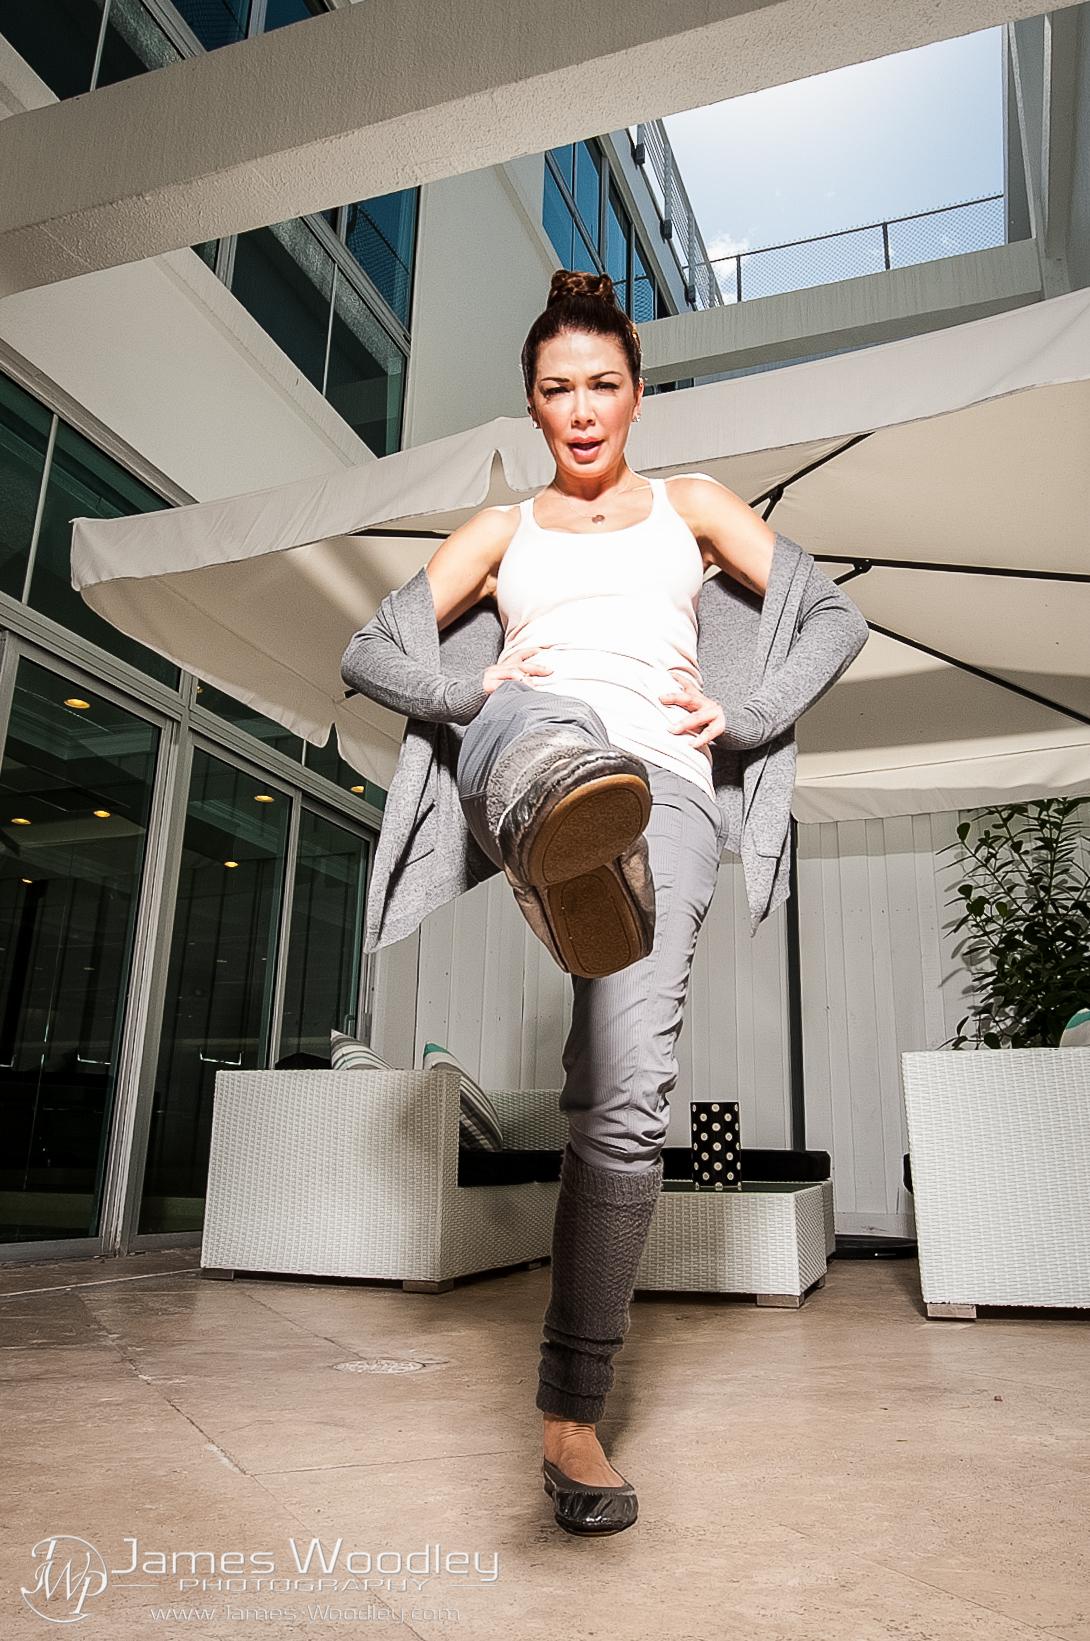 Shireen Sandoval - Shireen's Favorite Things - Barre Miami Blog - Ballerina Wannabe - James Woodley Photography